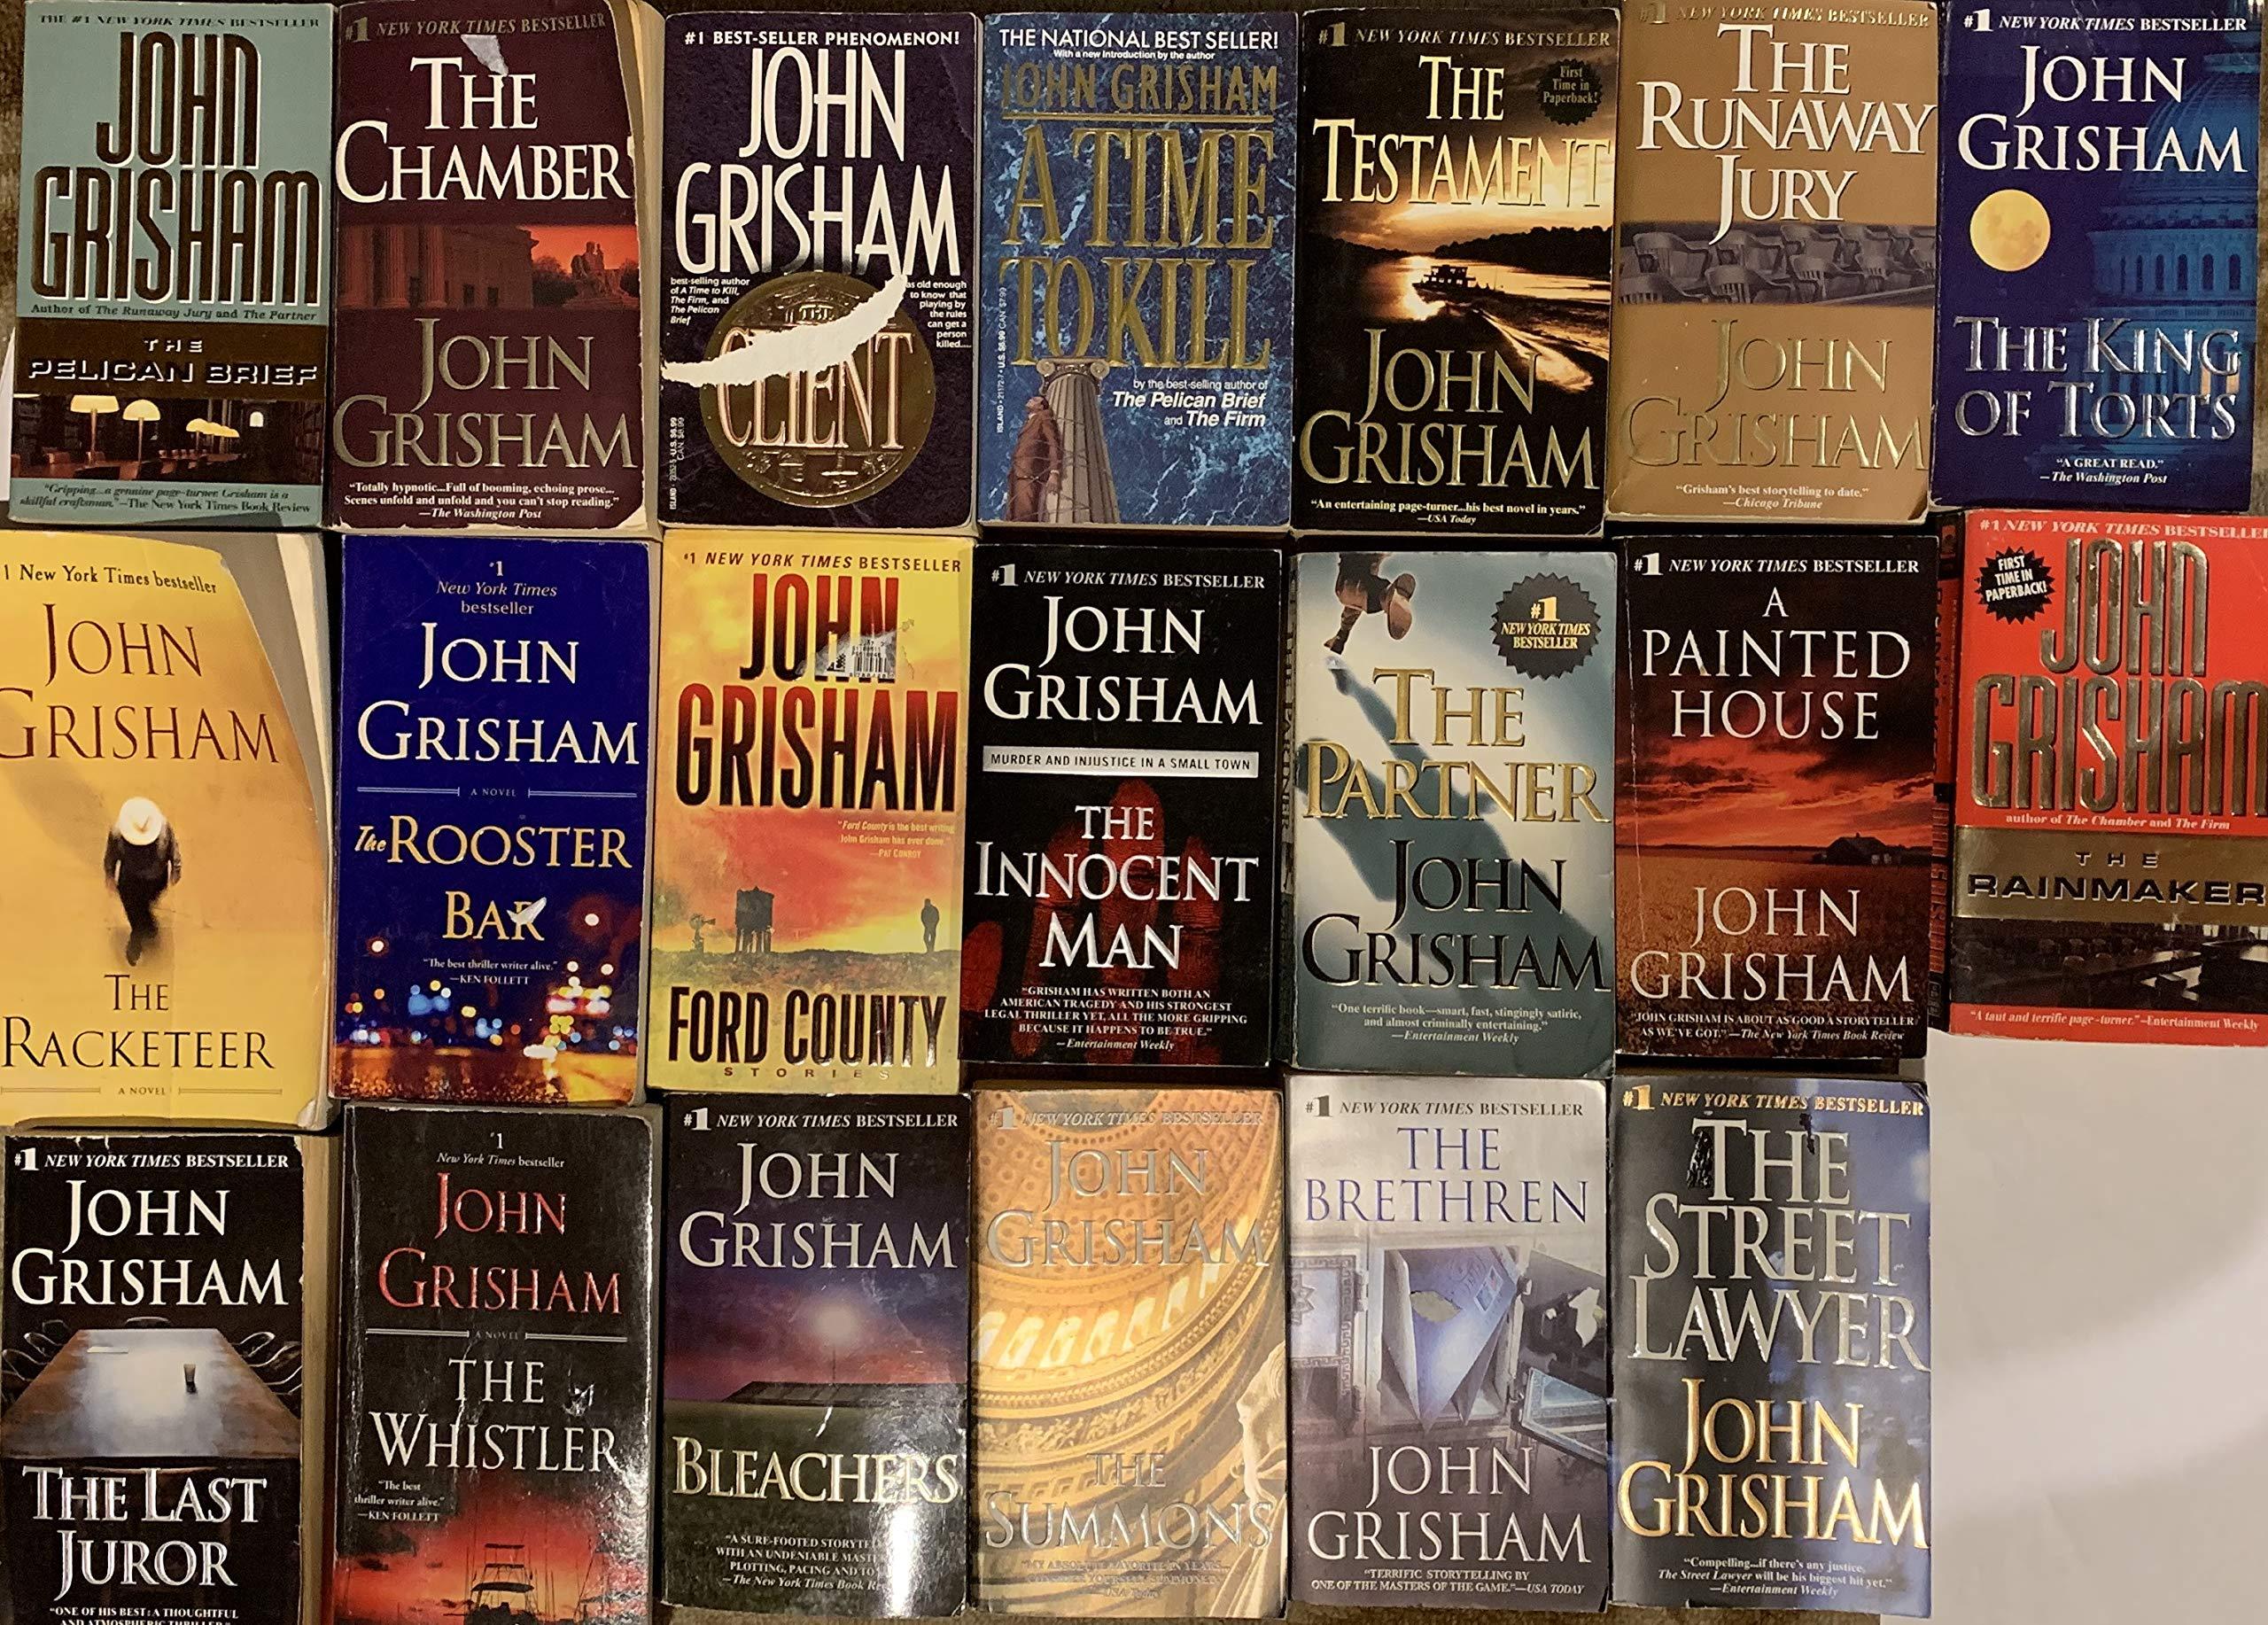 John Grisham Thriller Novel Collection 20 Book Set